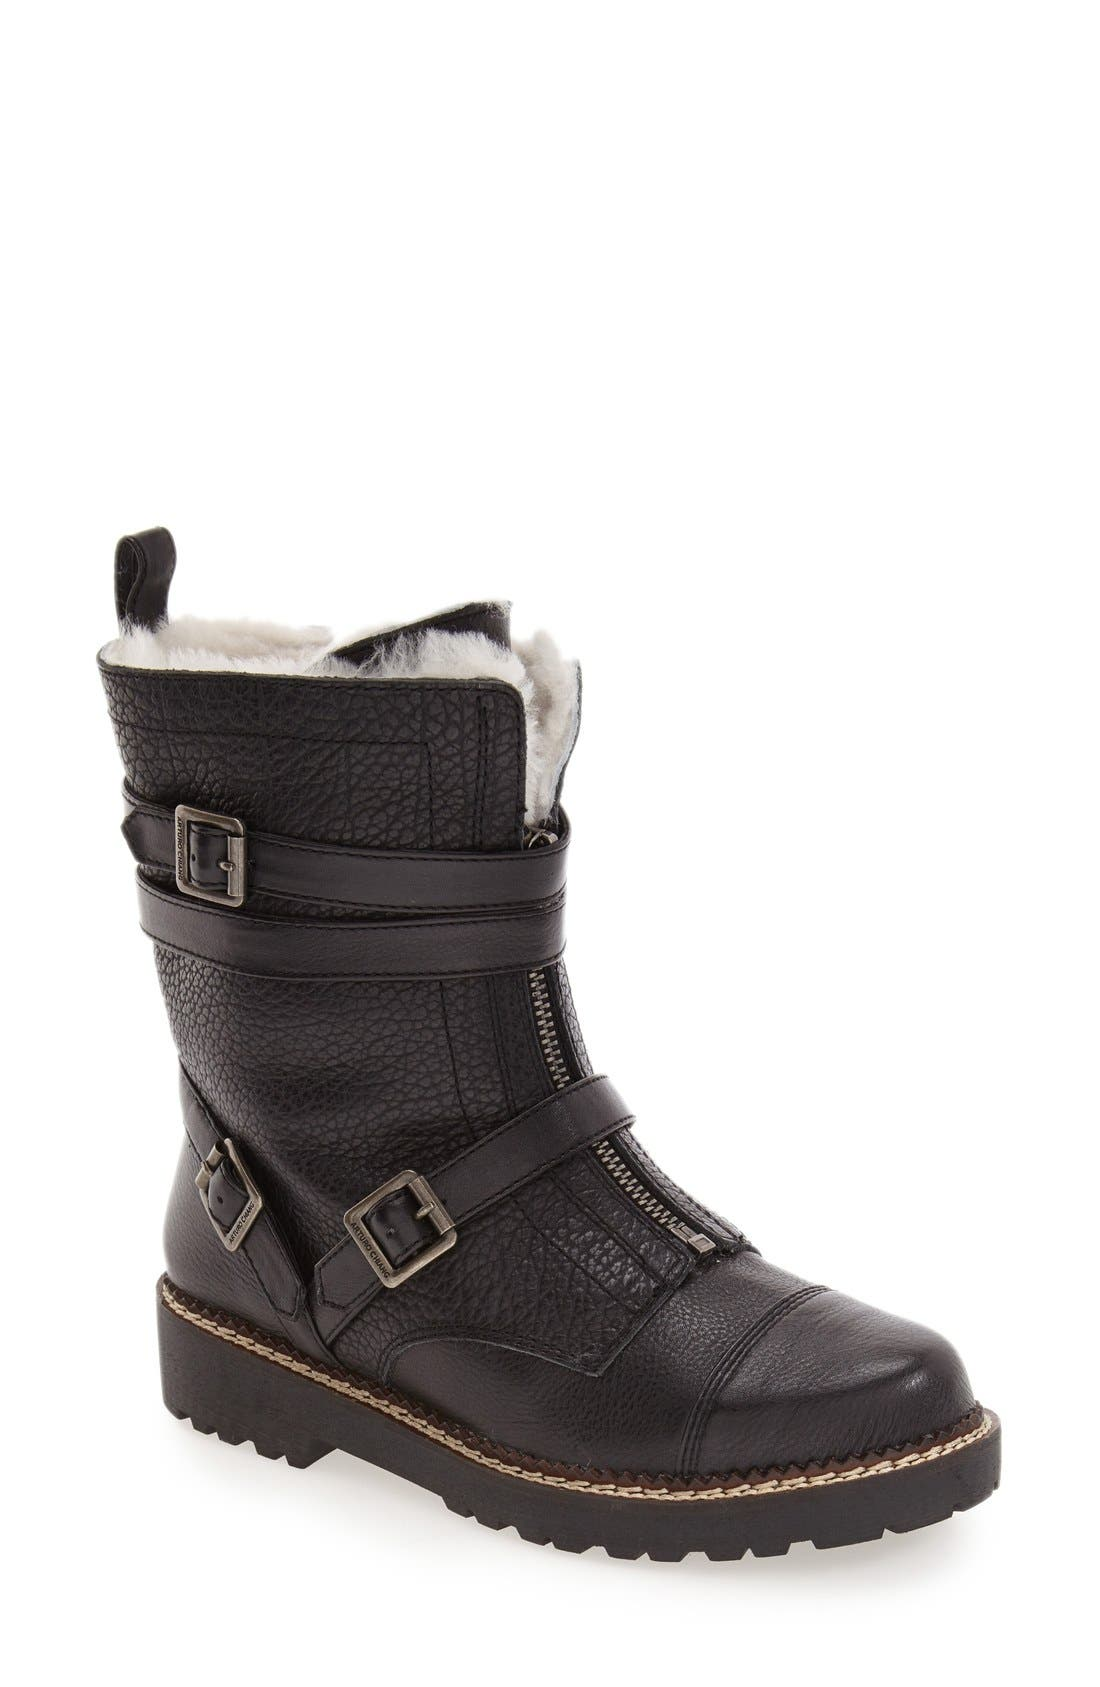 Alternate Image 1 Selected - Arturo Chiang 'Pelli' Genuine Shearling Lined Boot (Women)